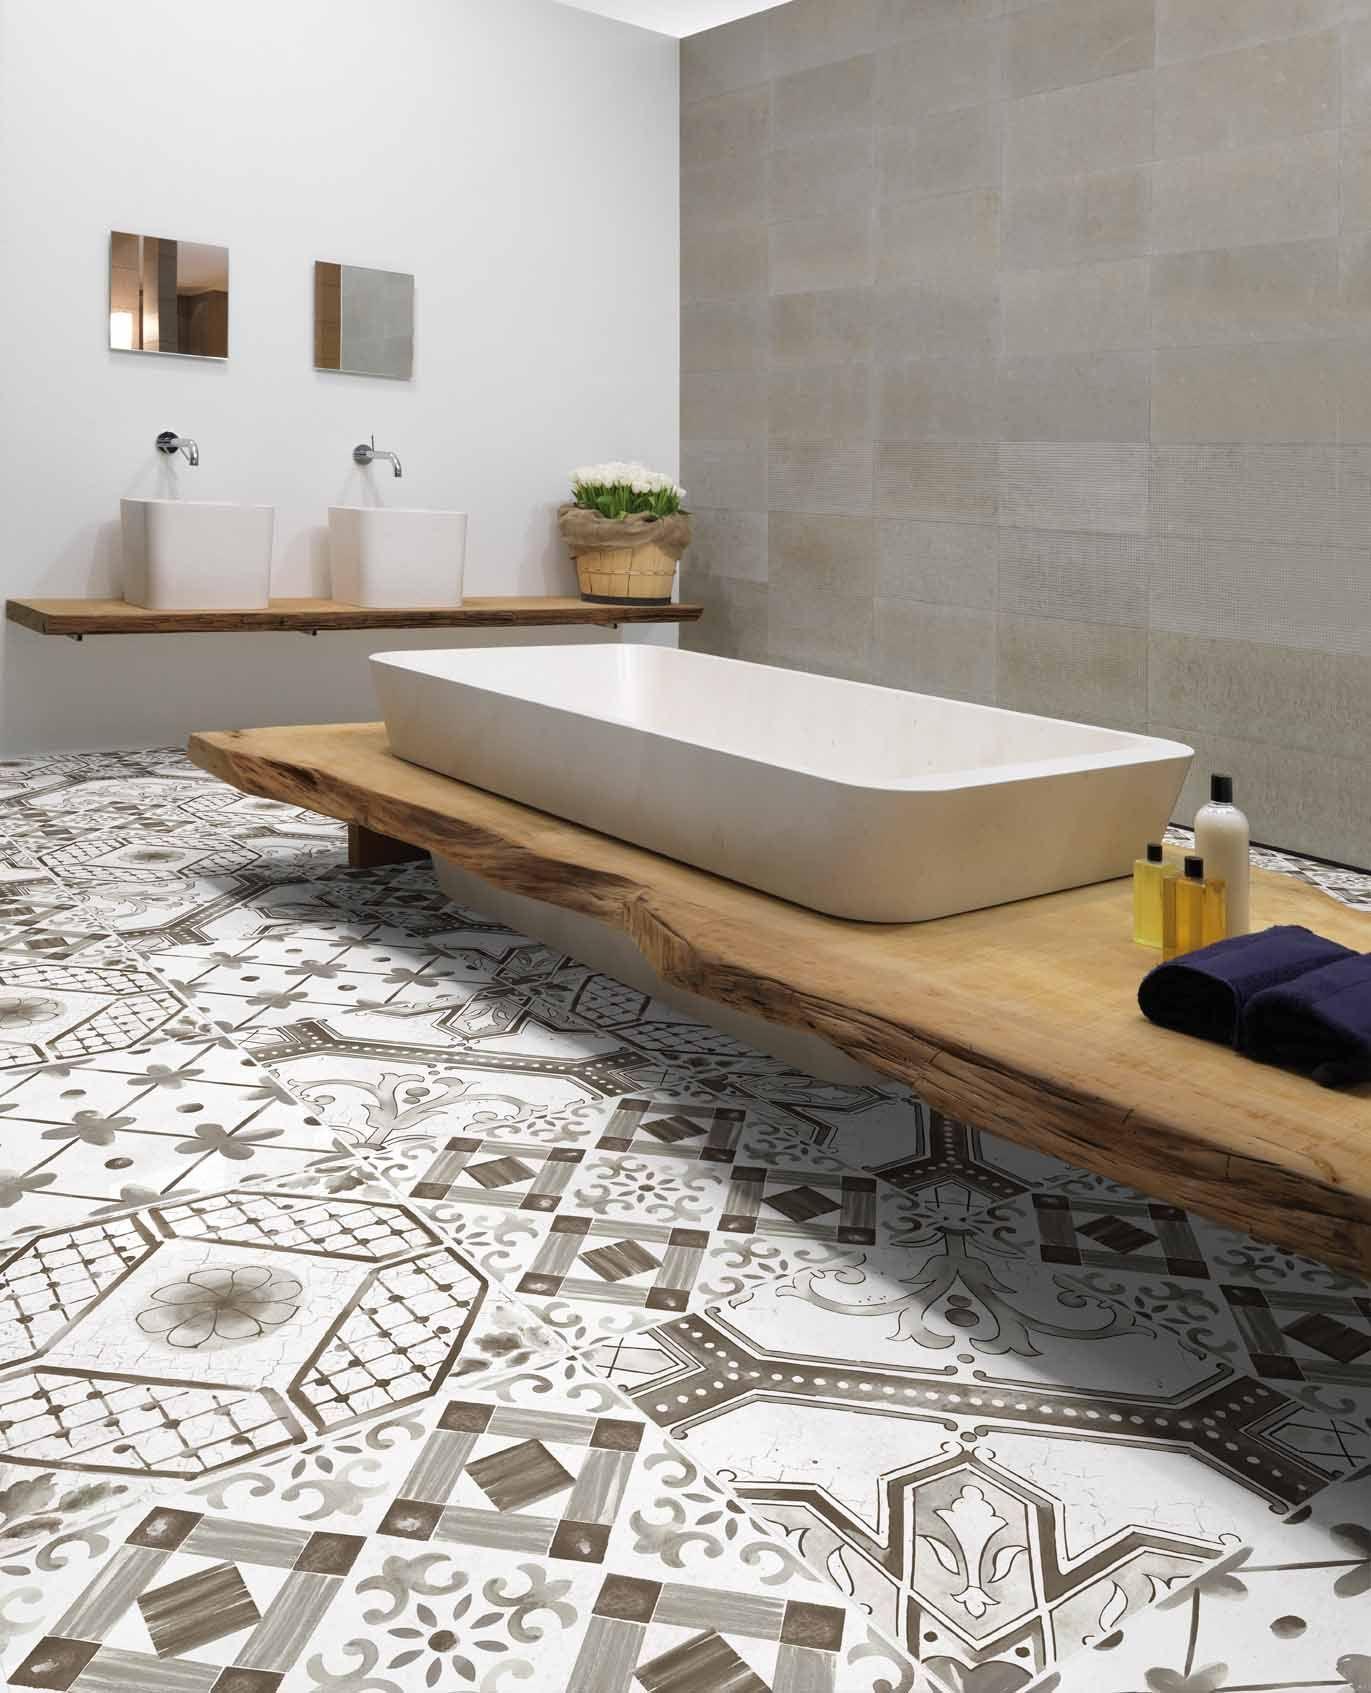 Porcelain stoneware wallfloor tiles grey mix maiolica mix porcelain stoneware wallfloor tiles black mix by unica by target studio baanklon Choice Image